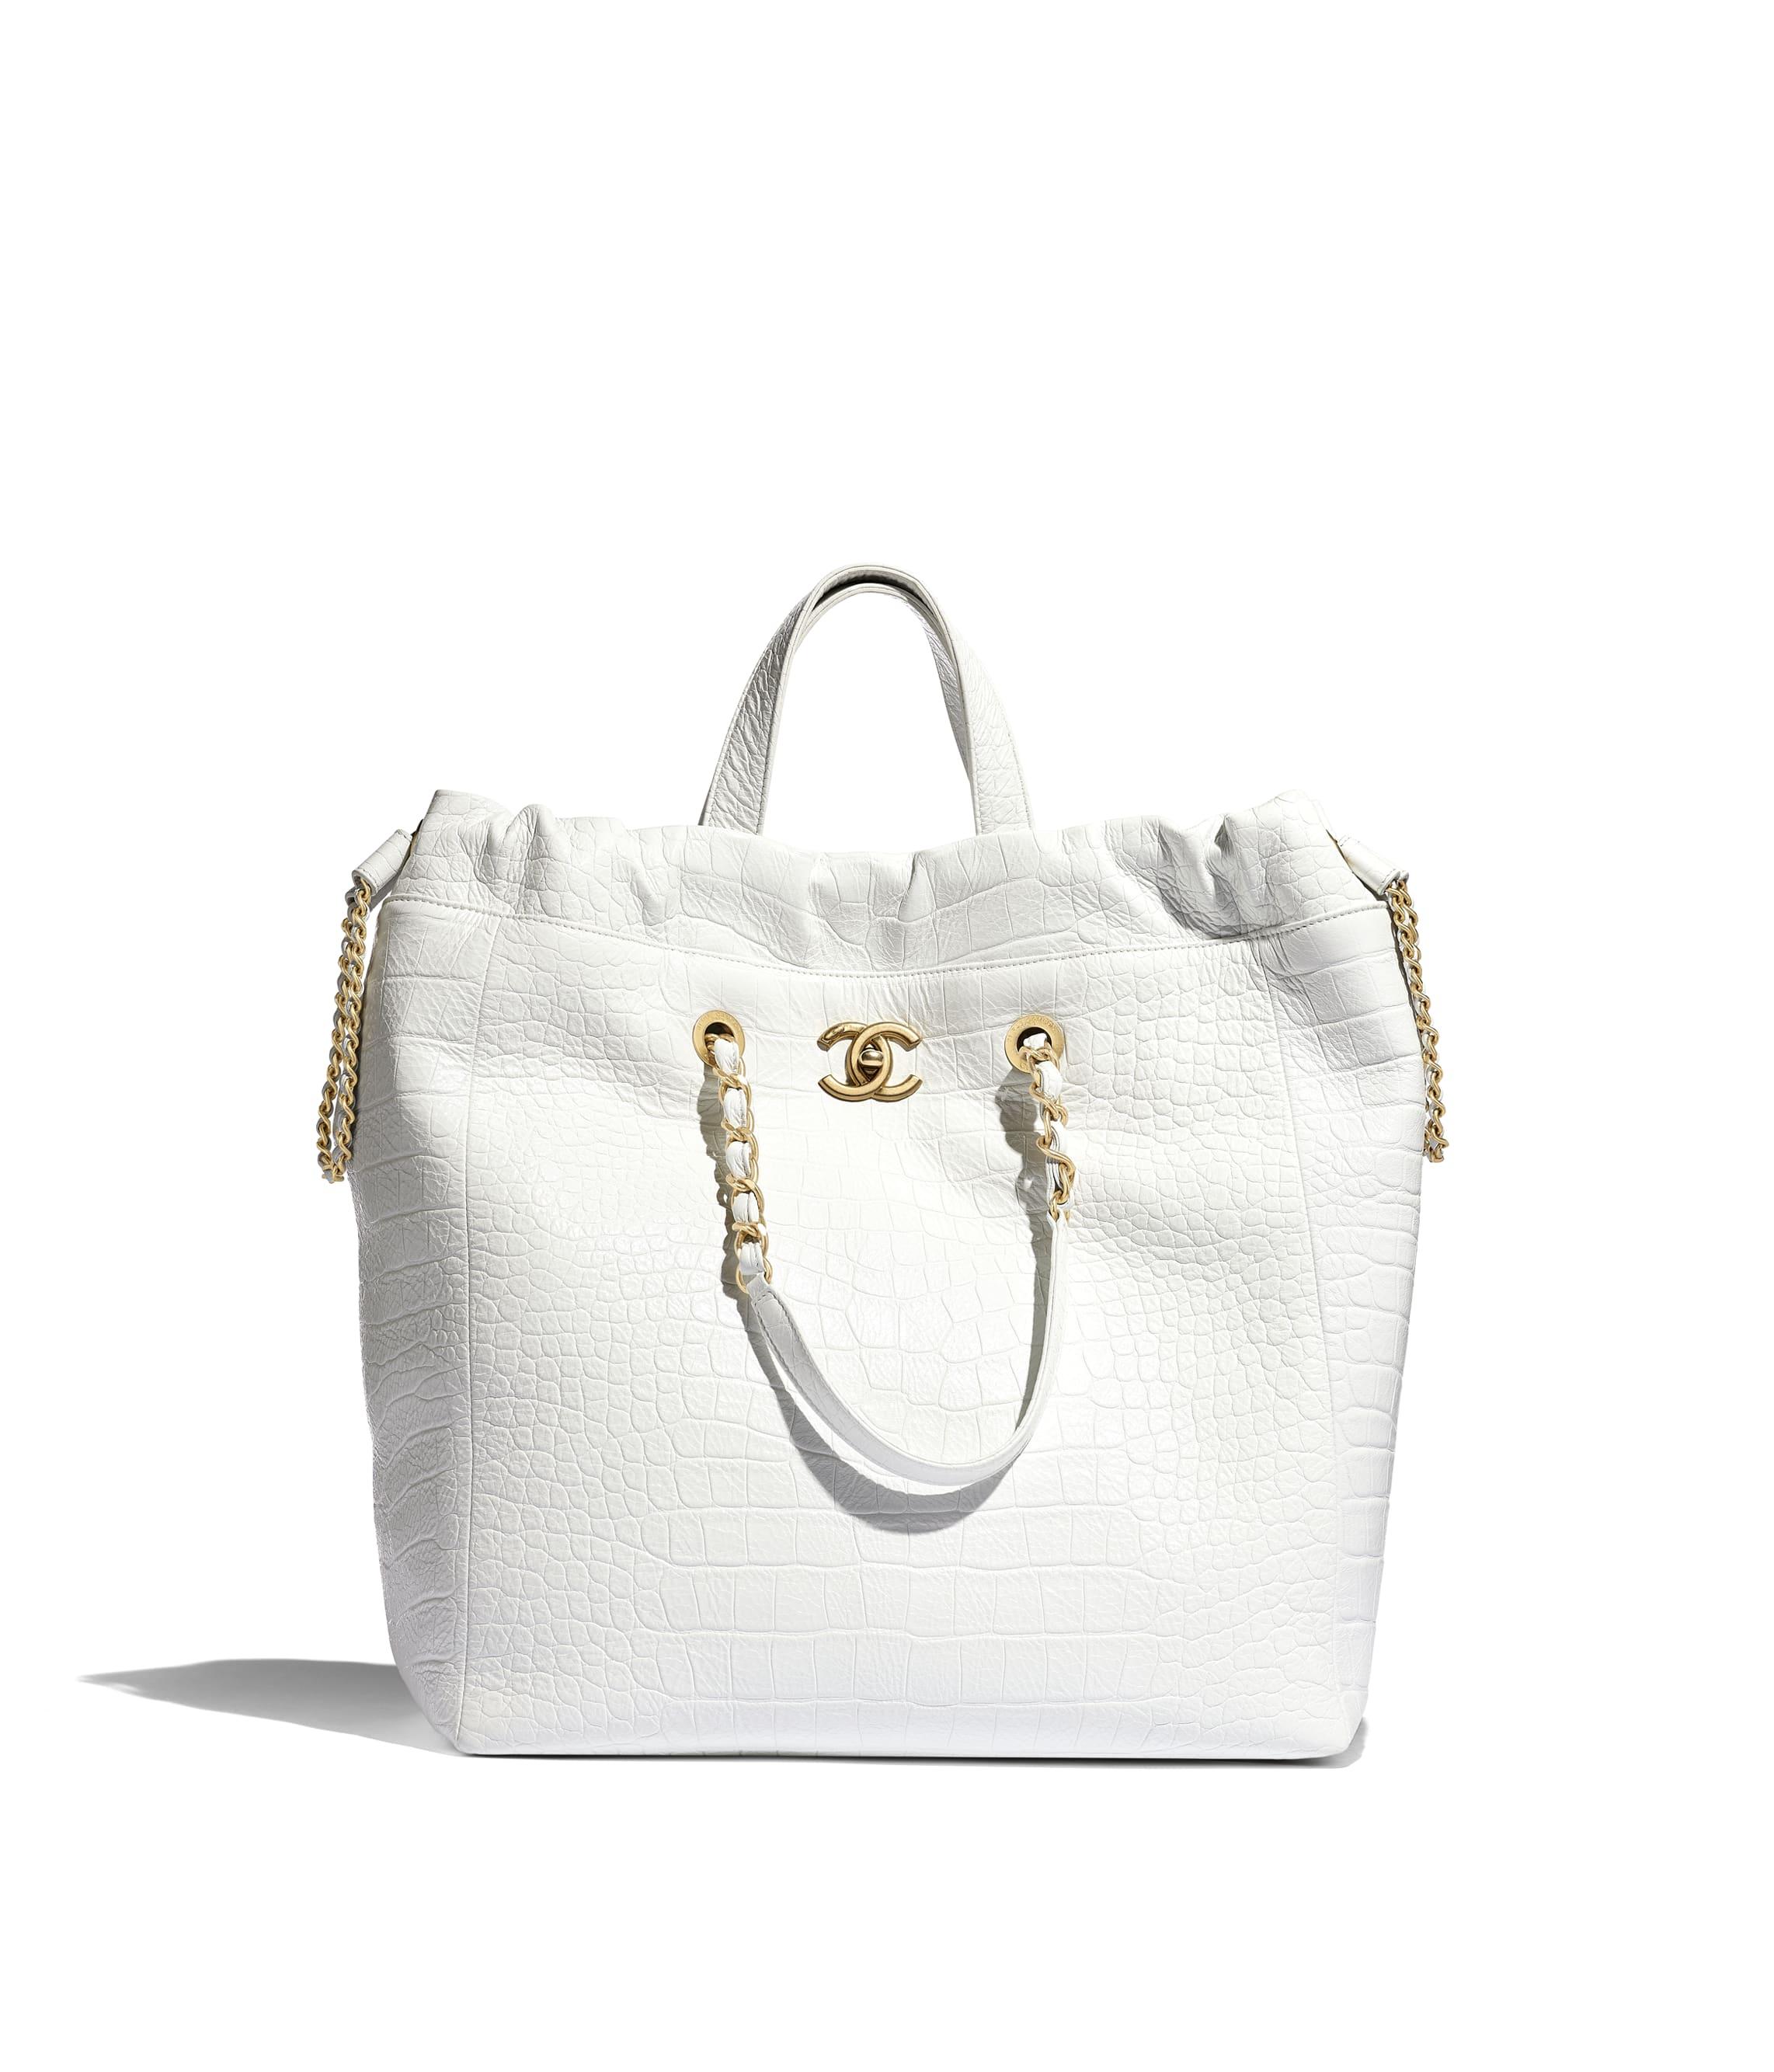 53f769f4abc1 Large Shopping Bag. Crocodile Embossed Printed…